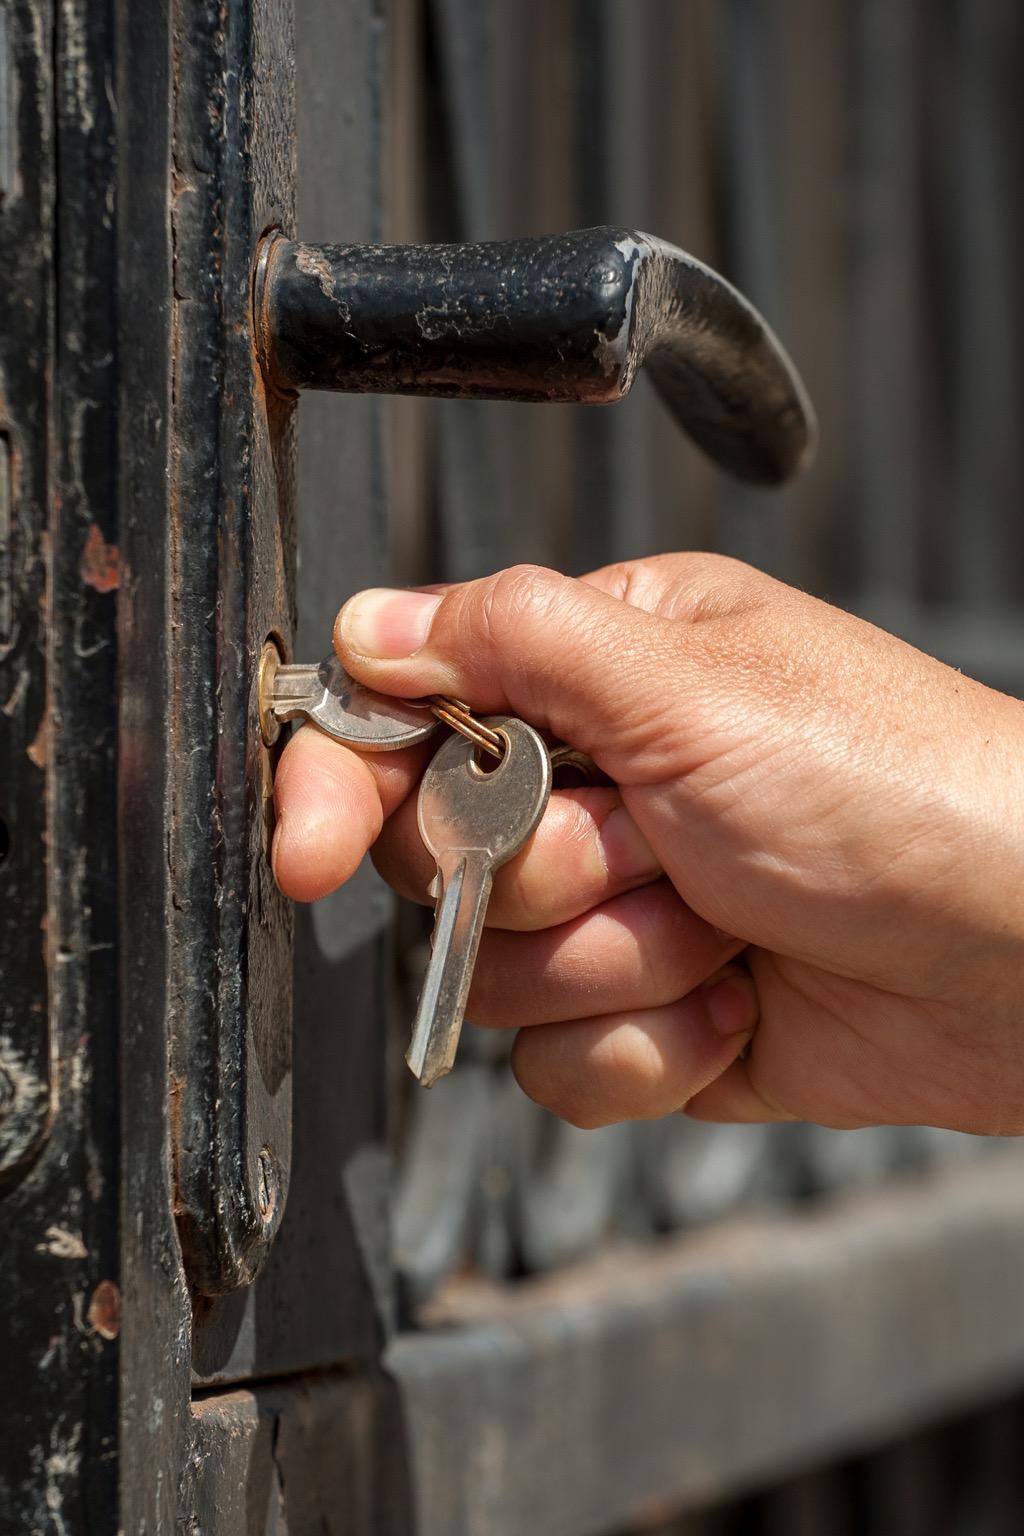 man locking door